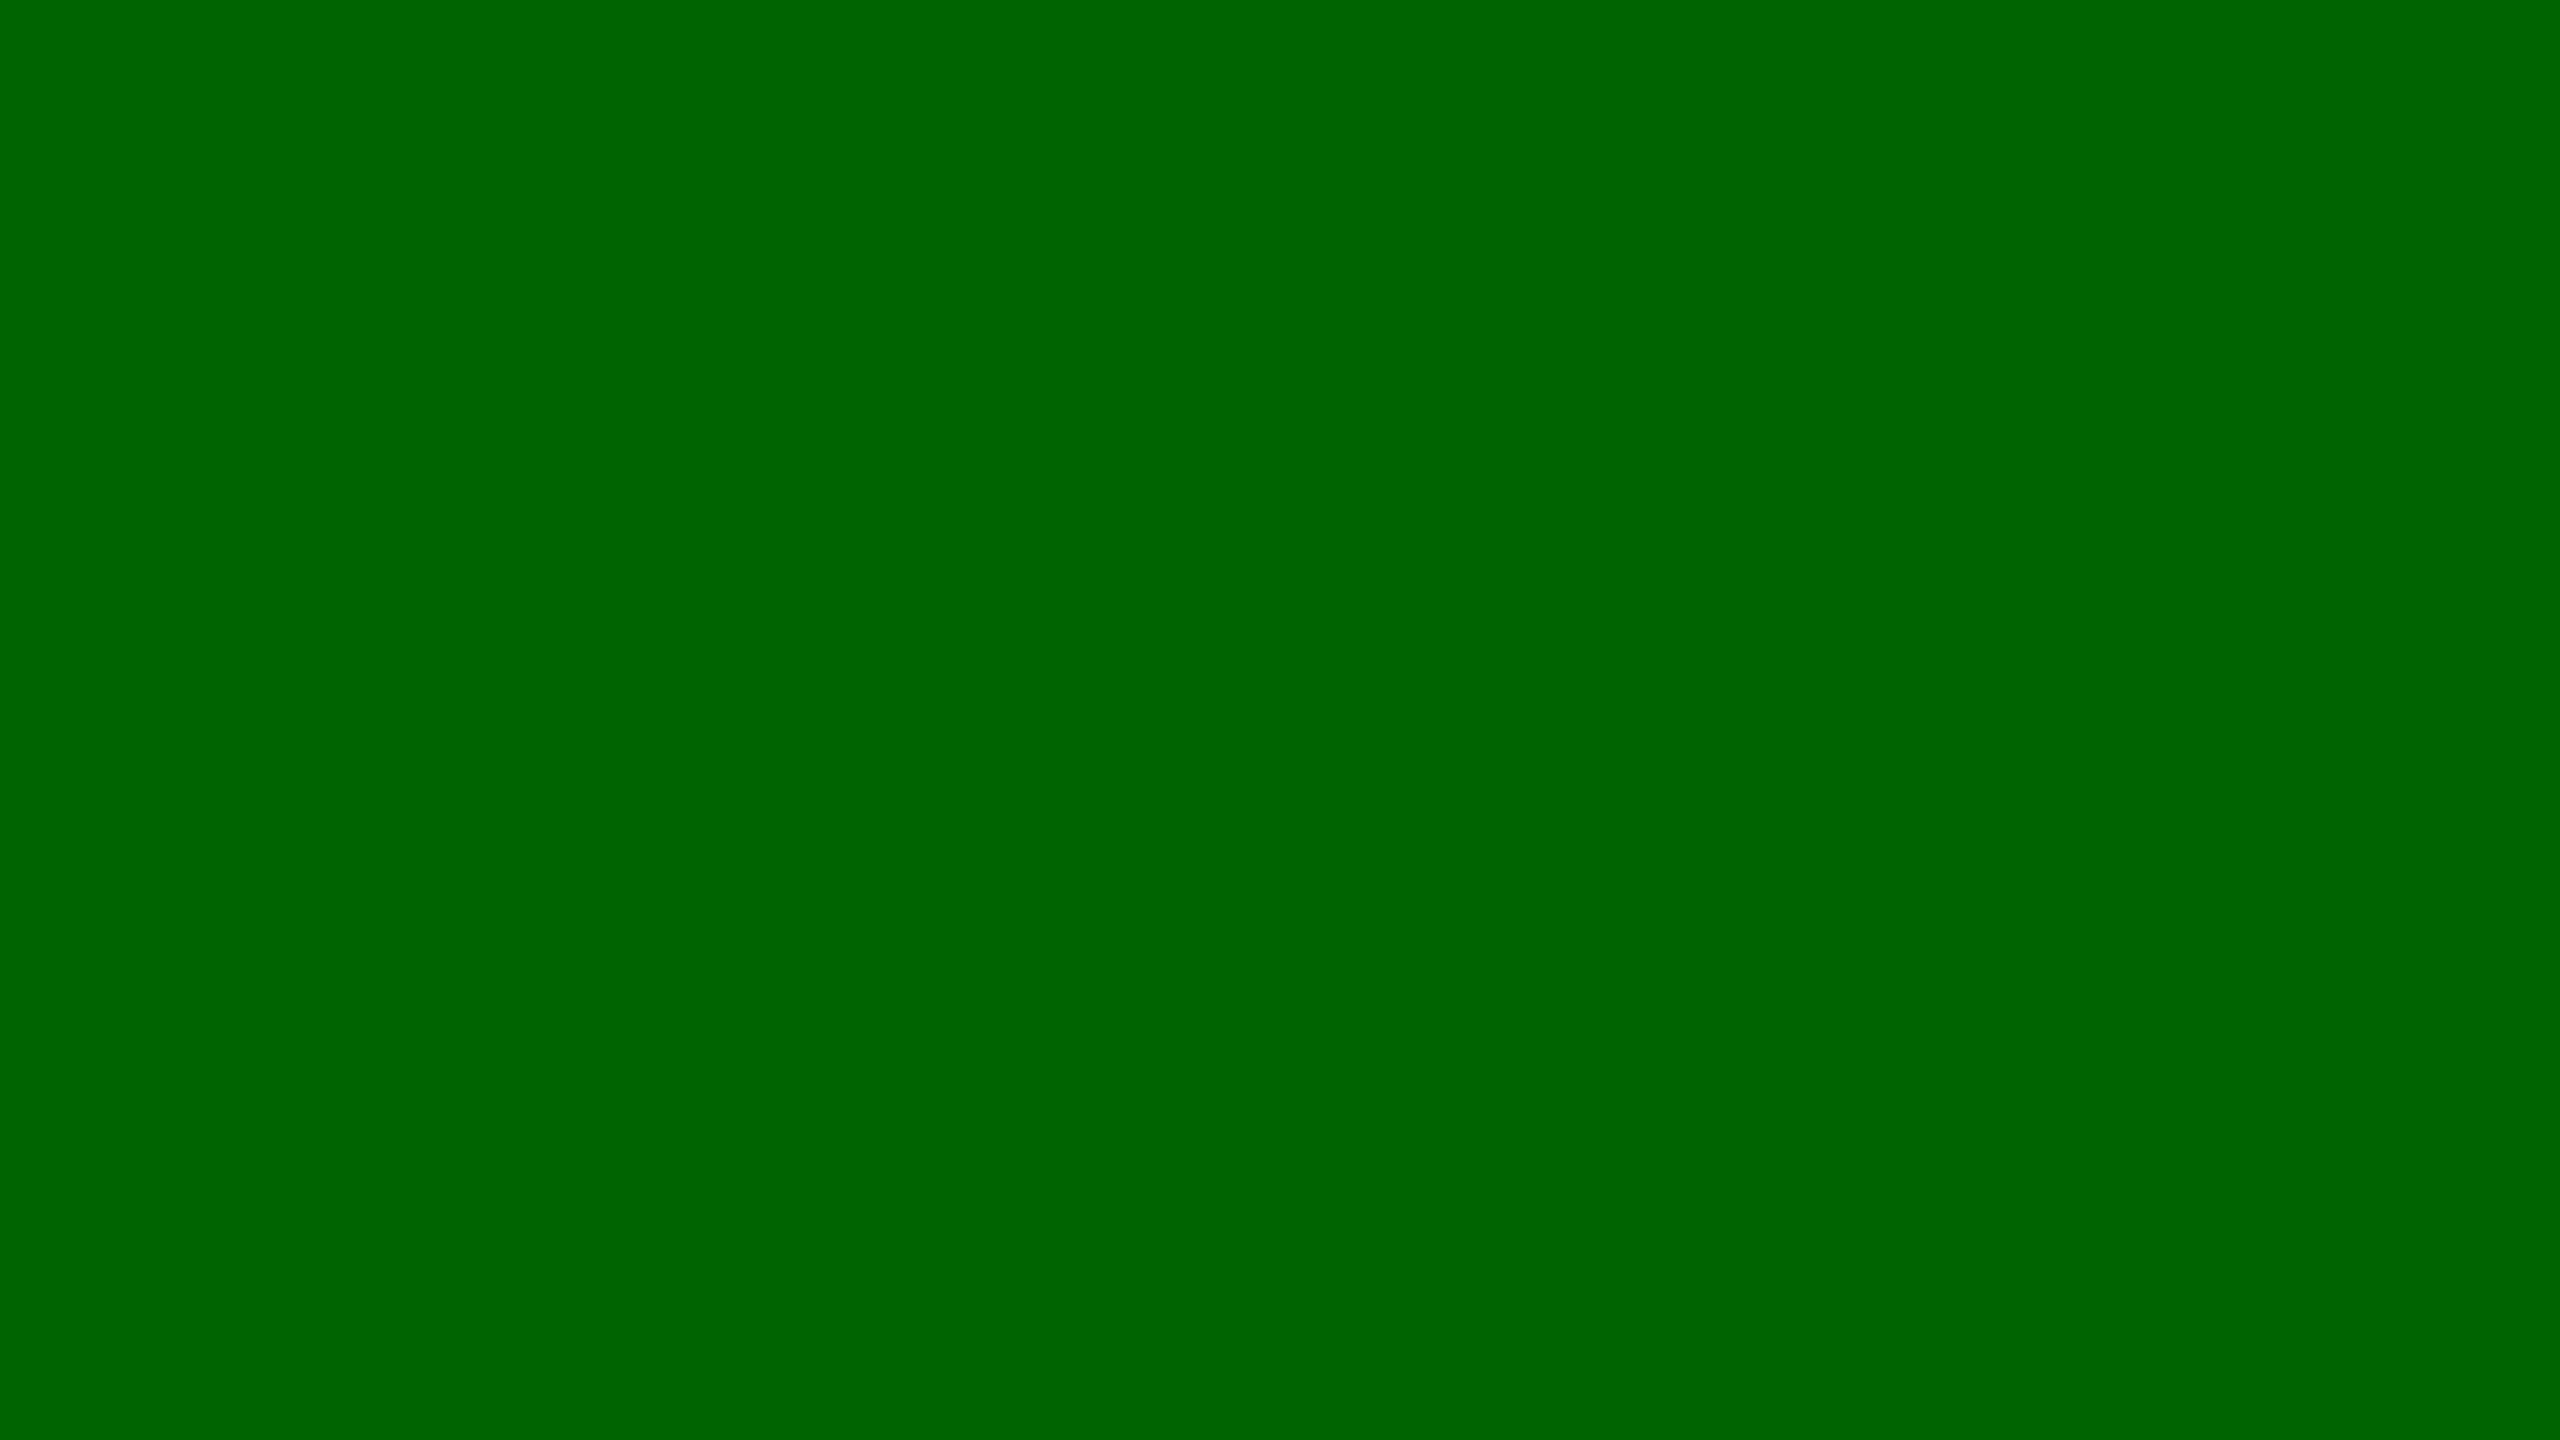 Dark Green Tumblr Backgrounds x3cbx3edark green backgroundx3cbx3e 9gPTx3zf